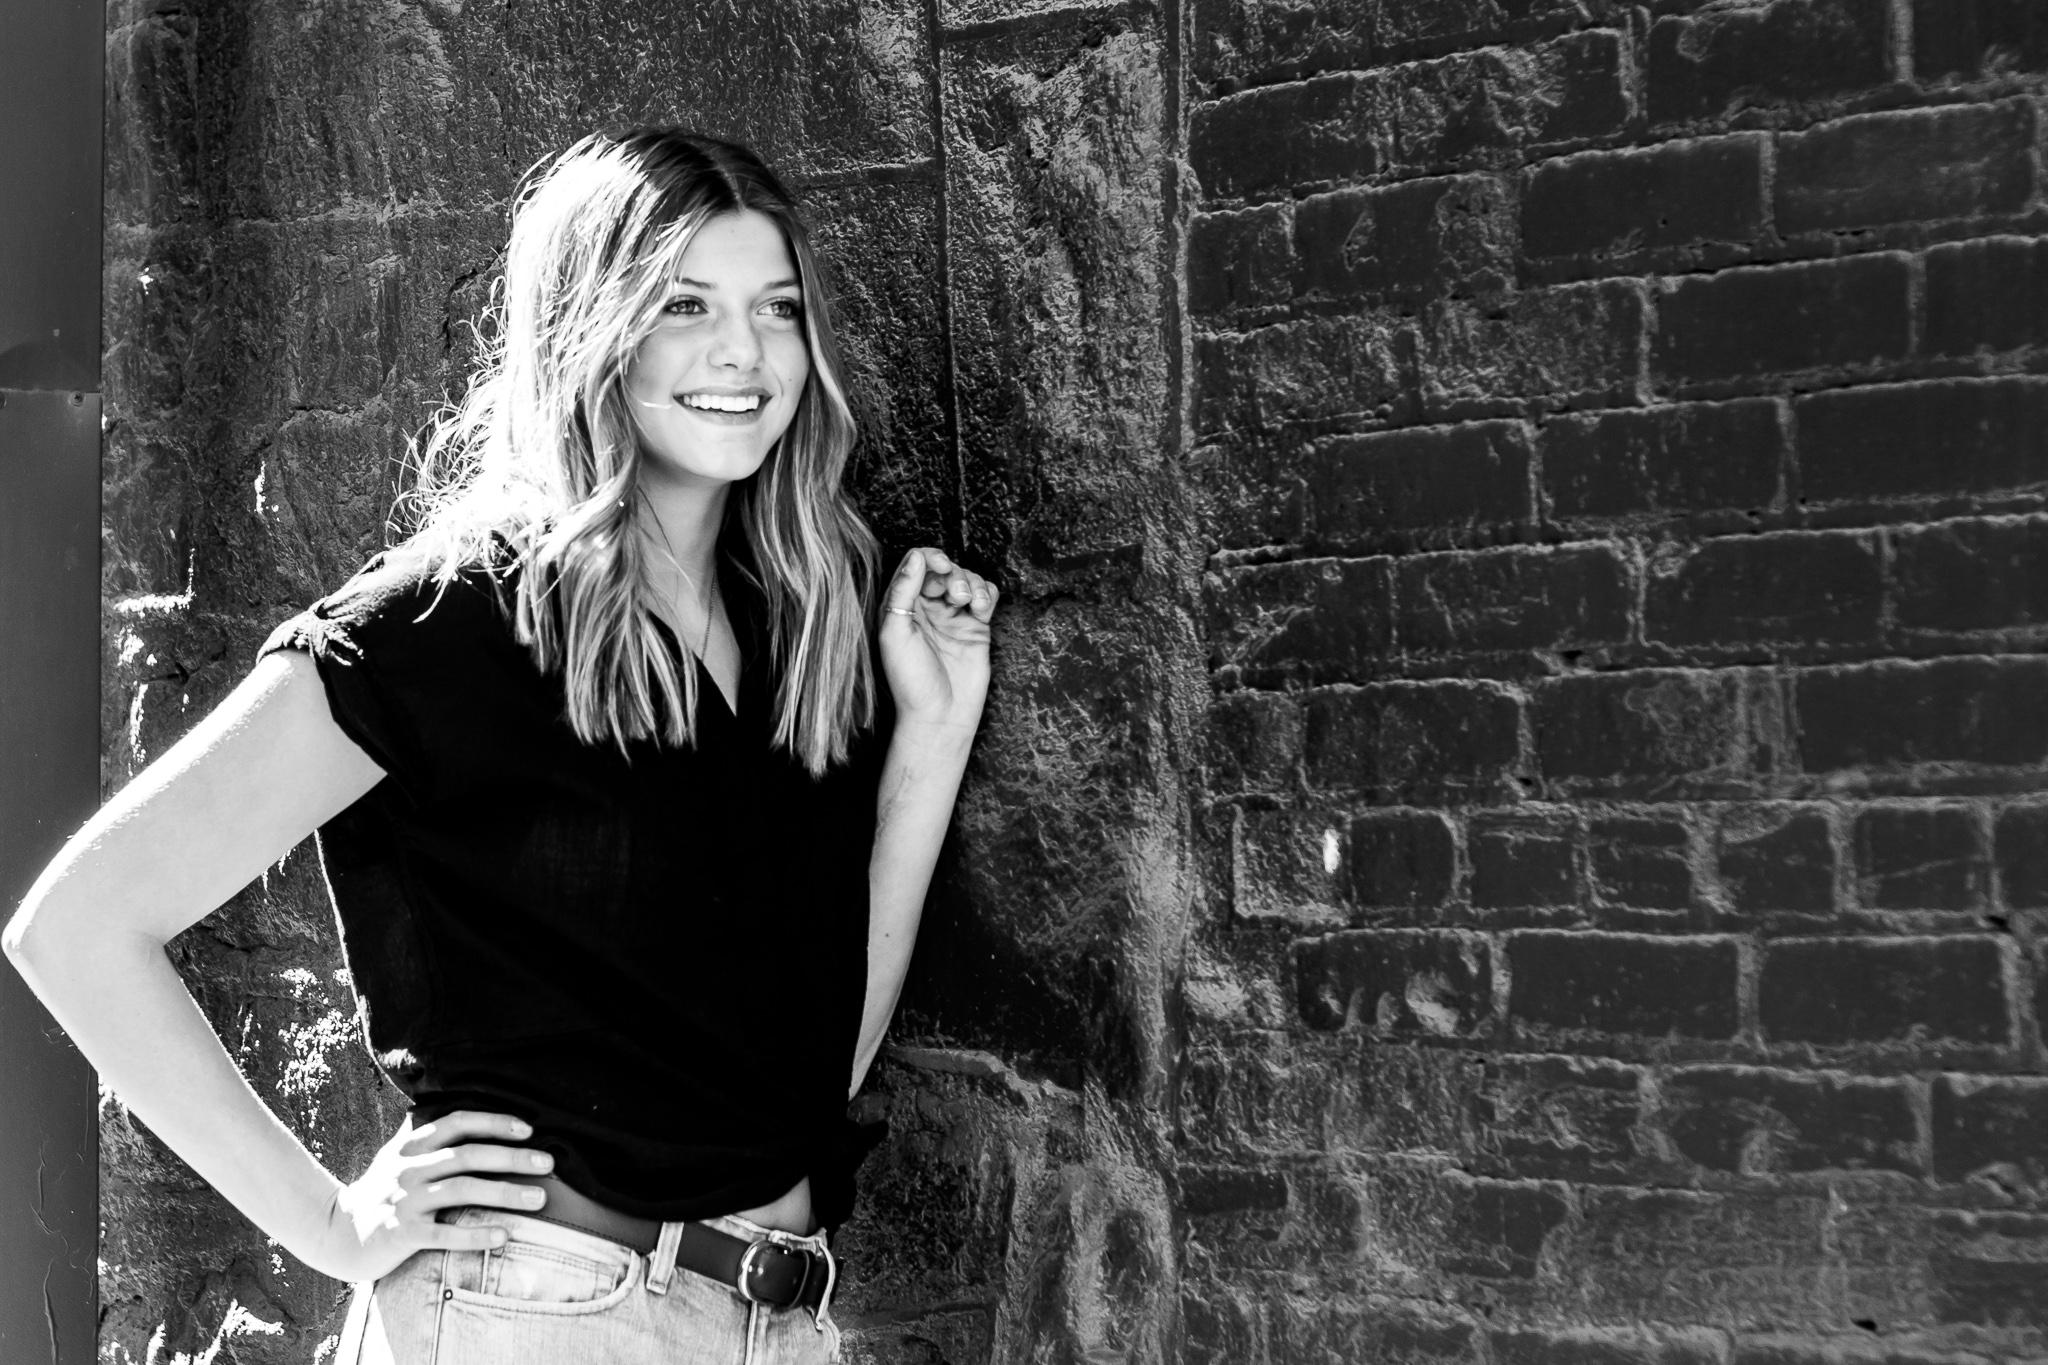 Danika_s Senior Photos 2019 {Rachel Krug Photography} (45)